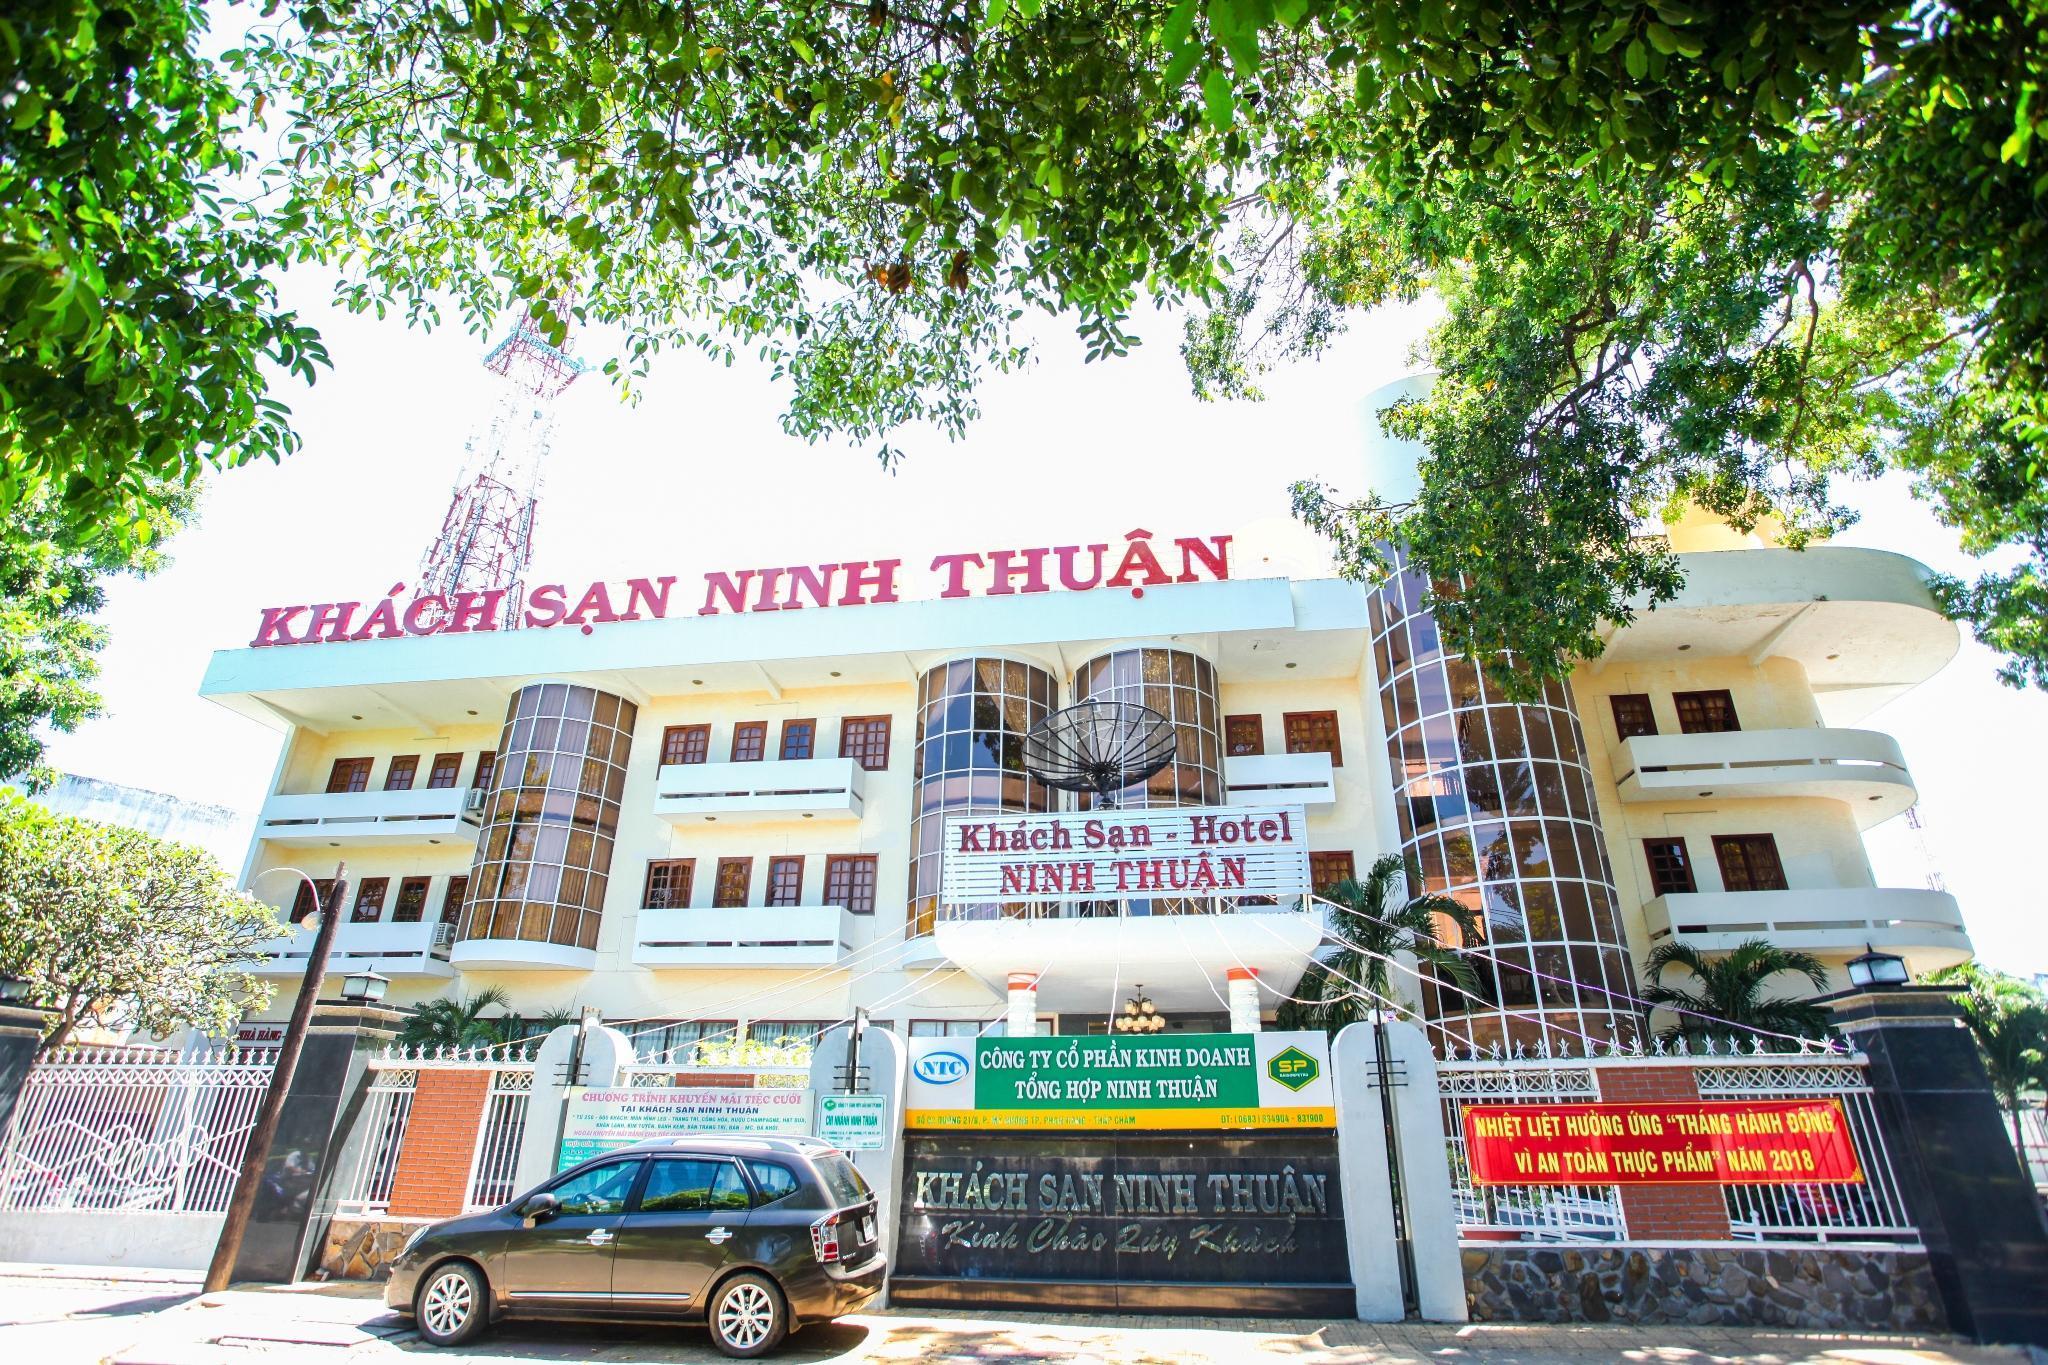 Ninh Thuan Hotel